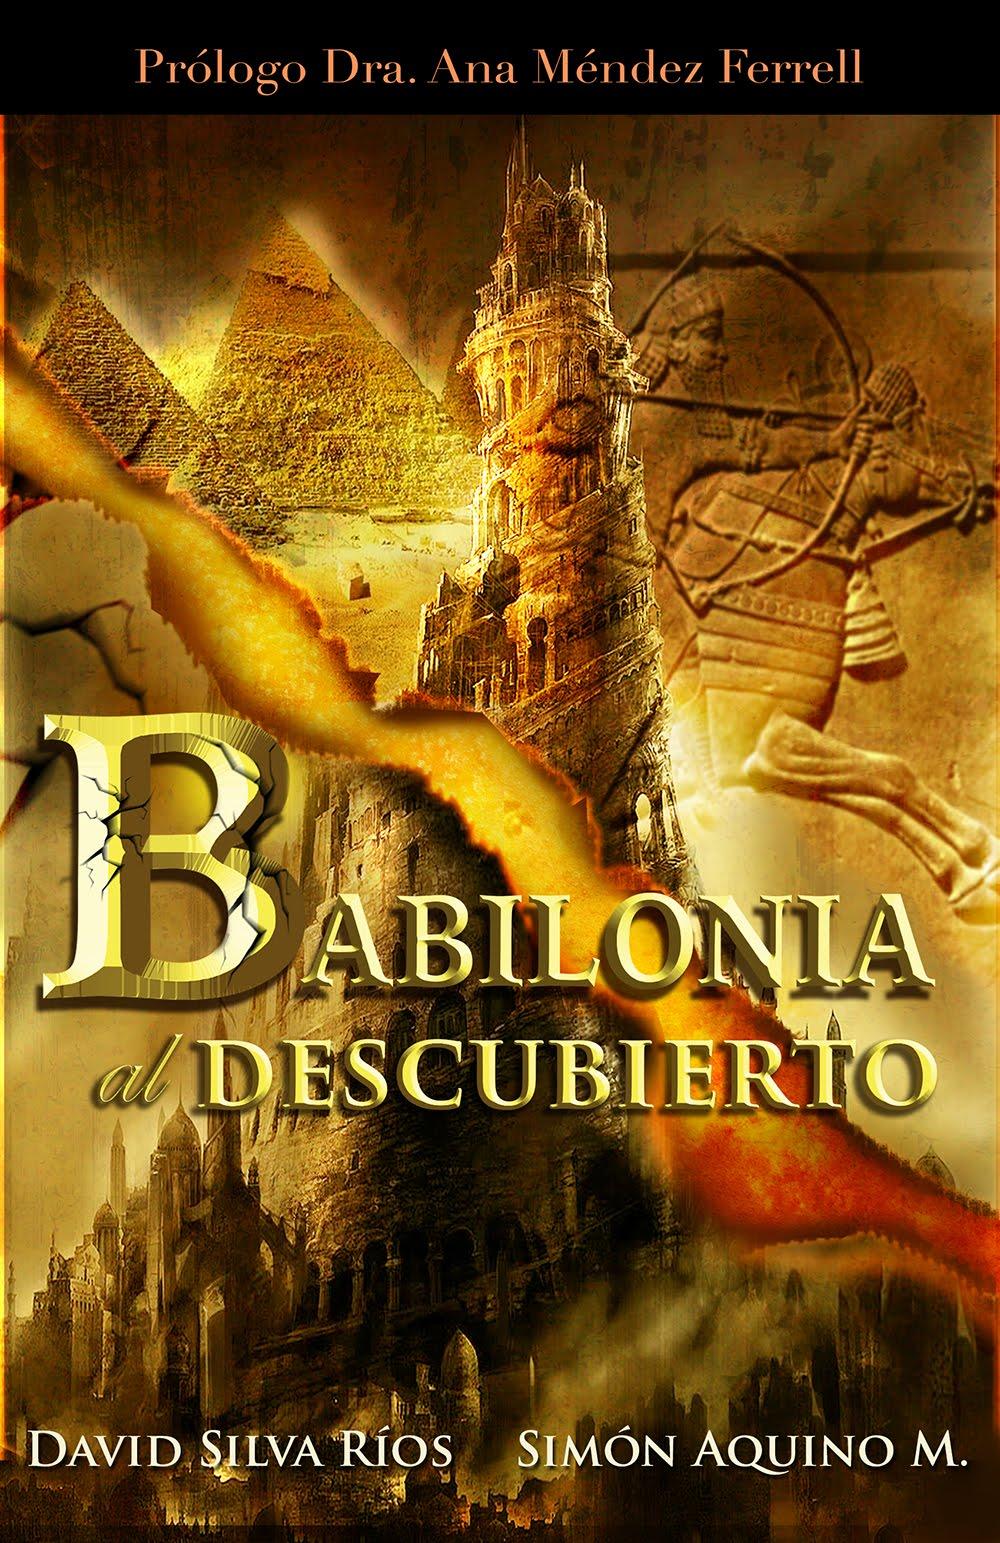 BABILONIA AL DESCUBIERTO